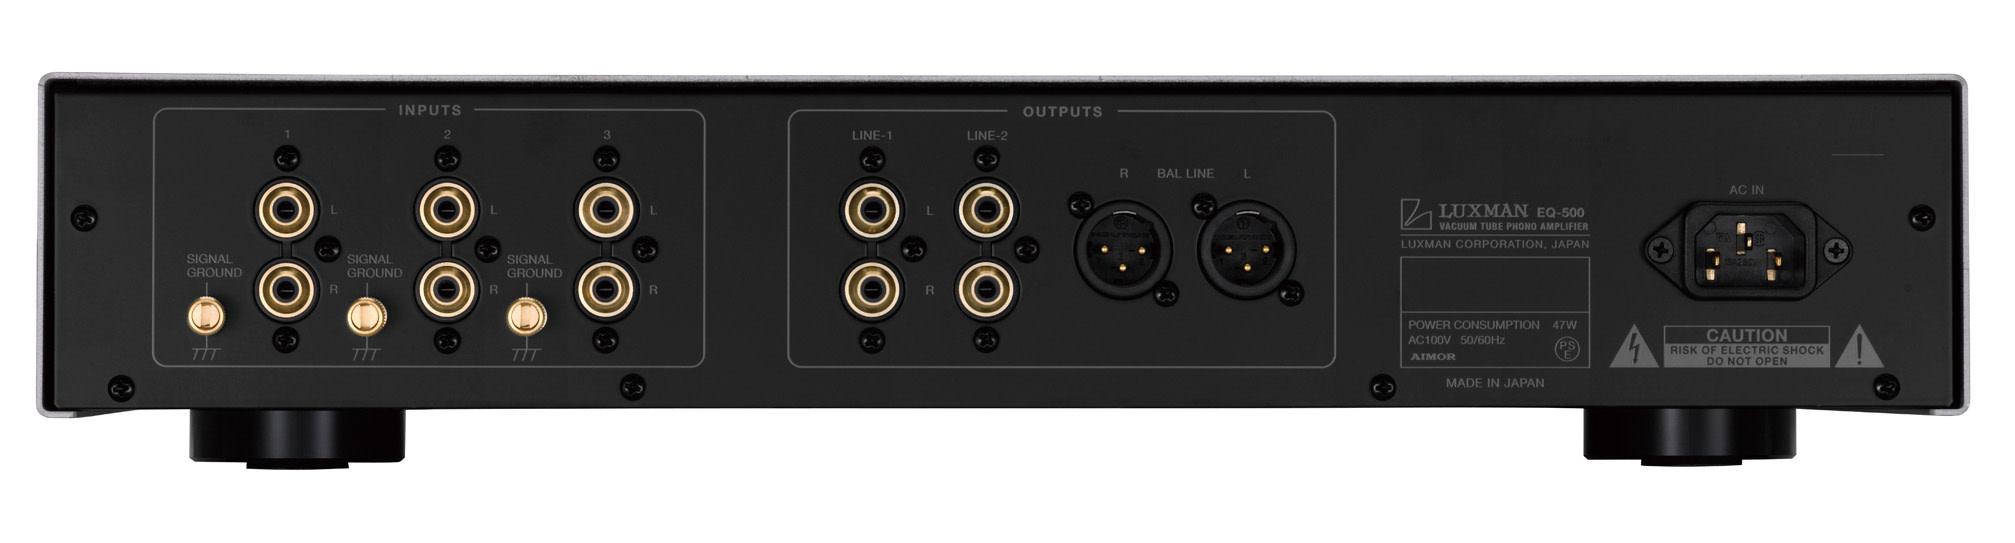 Luxman Phono Amplifier EQ-500